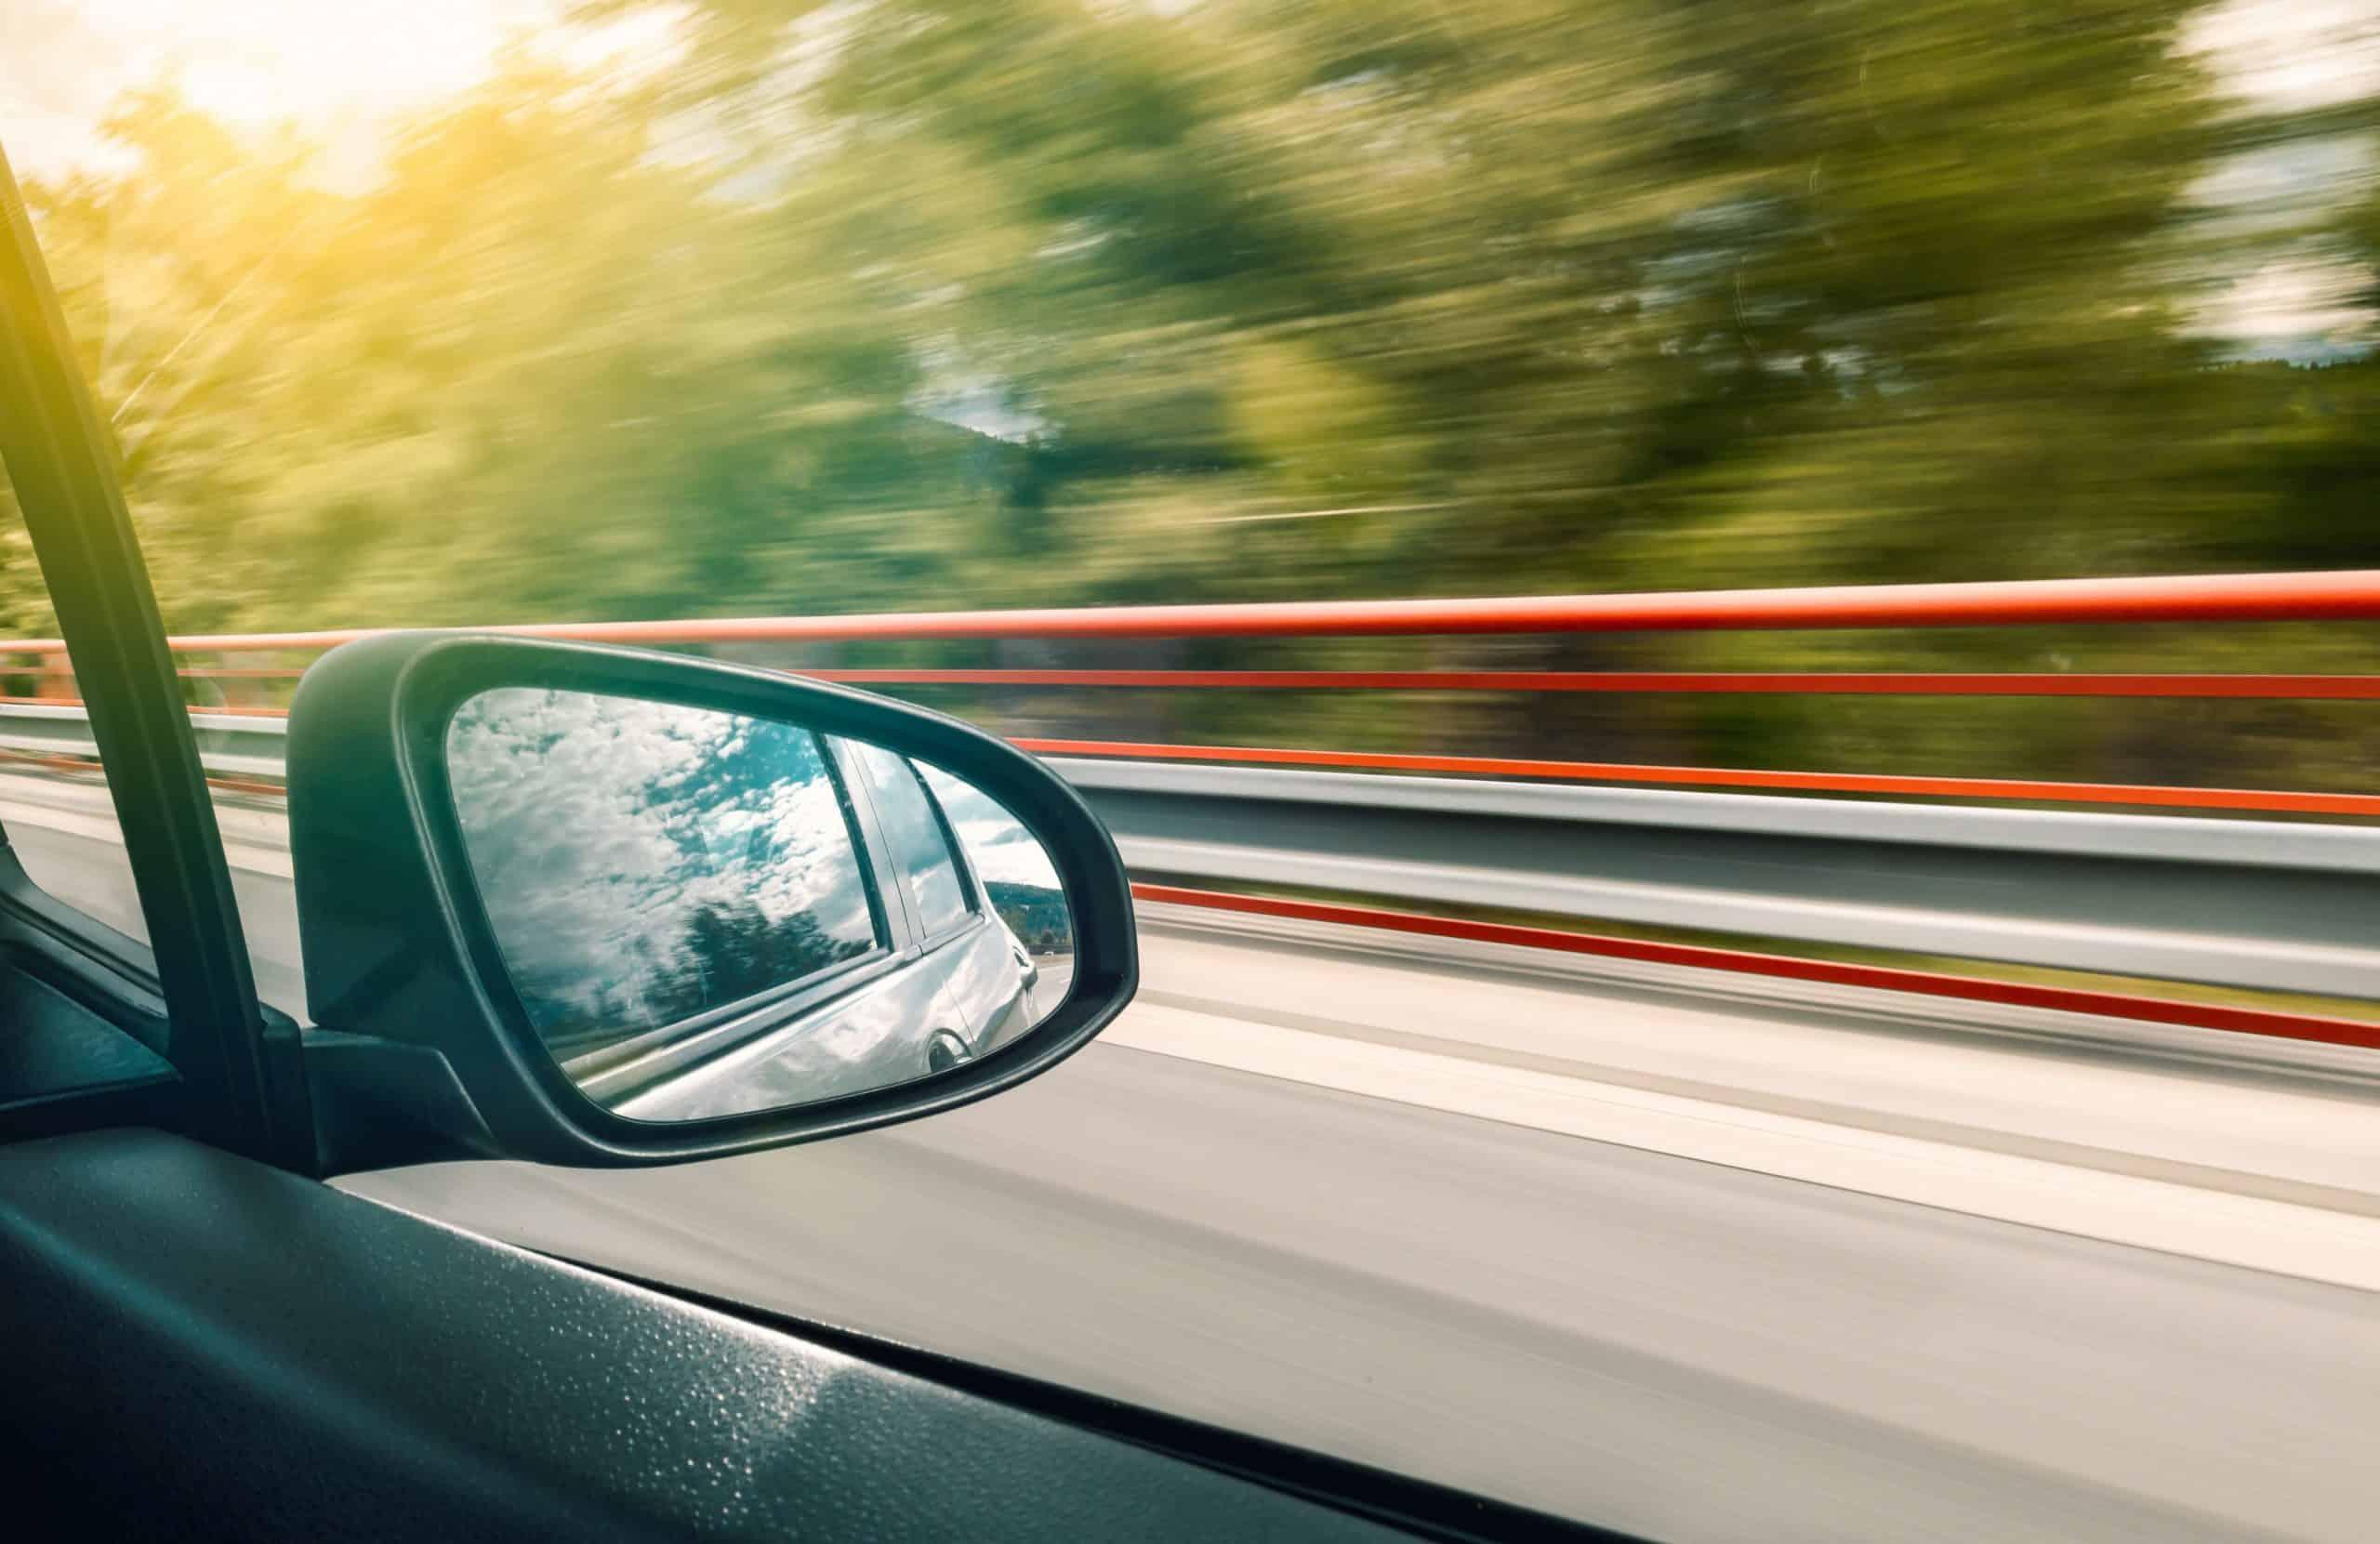 One Dead One Injured in Single-Vehicle Crash on Highway 3 [Hayfork, CA]